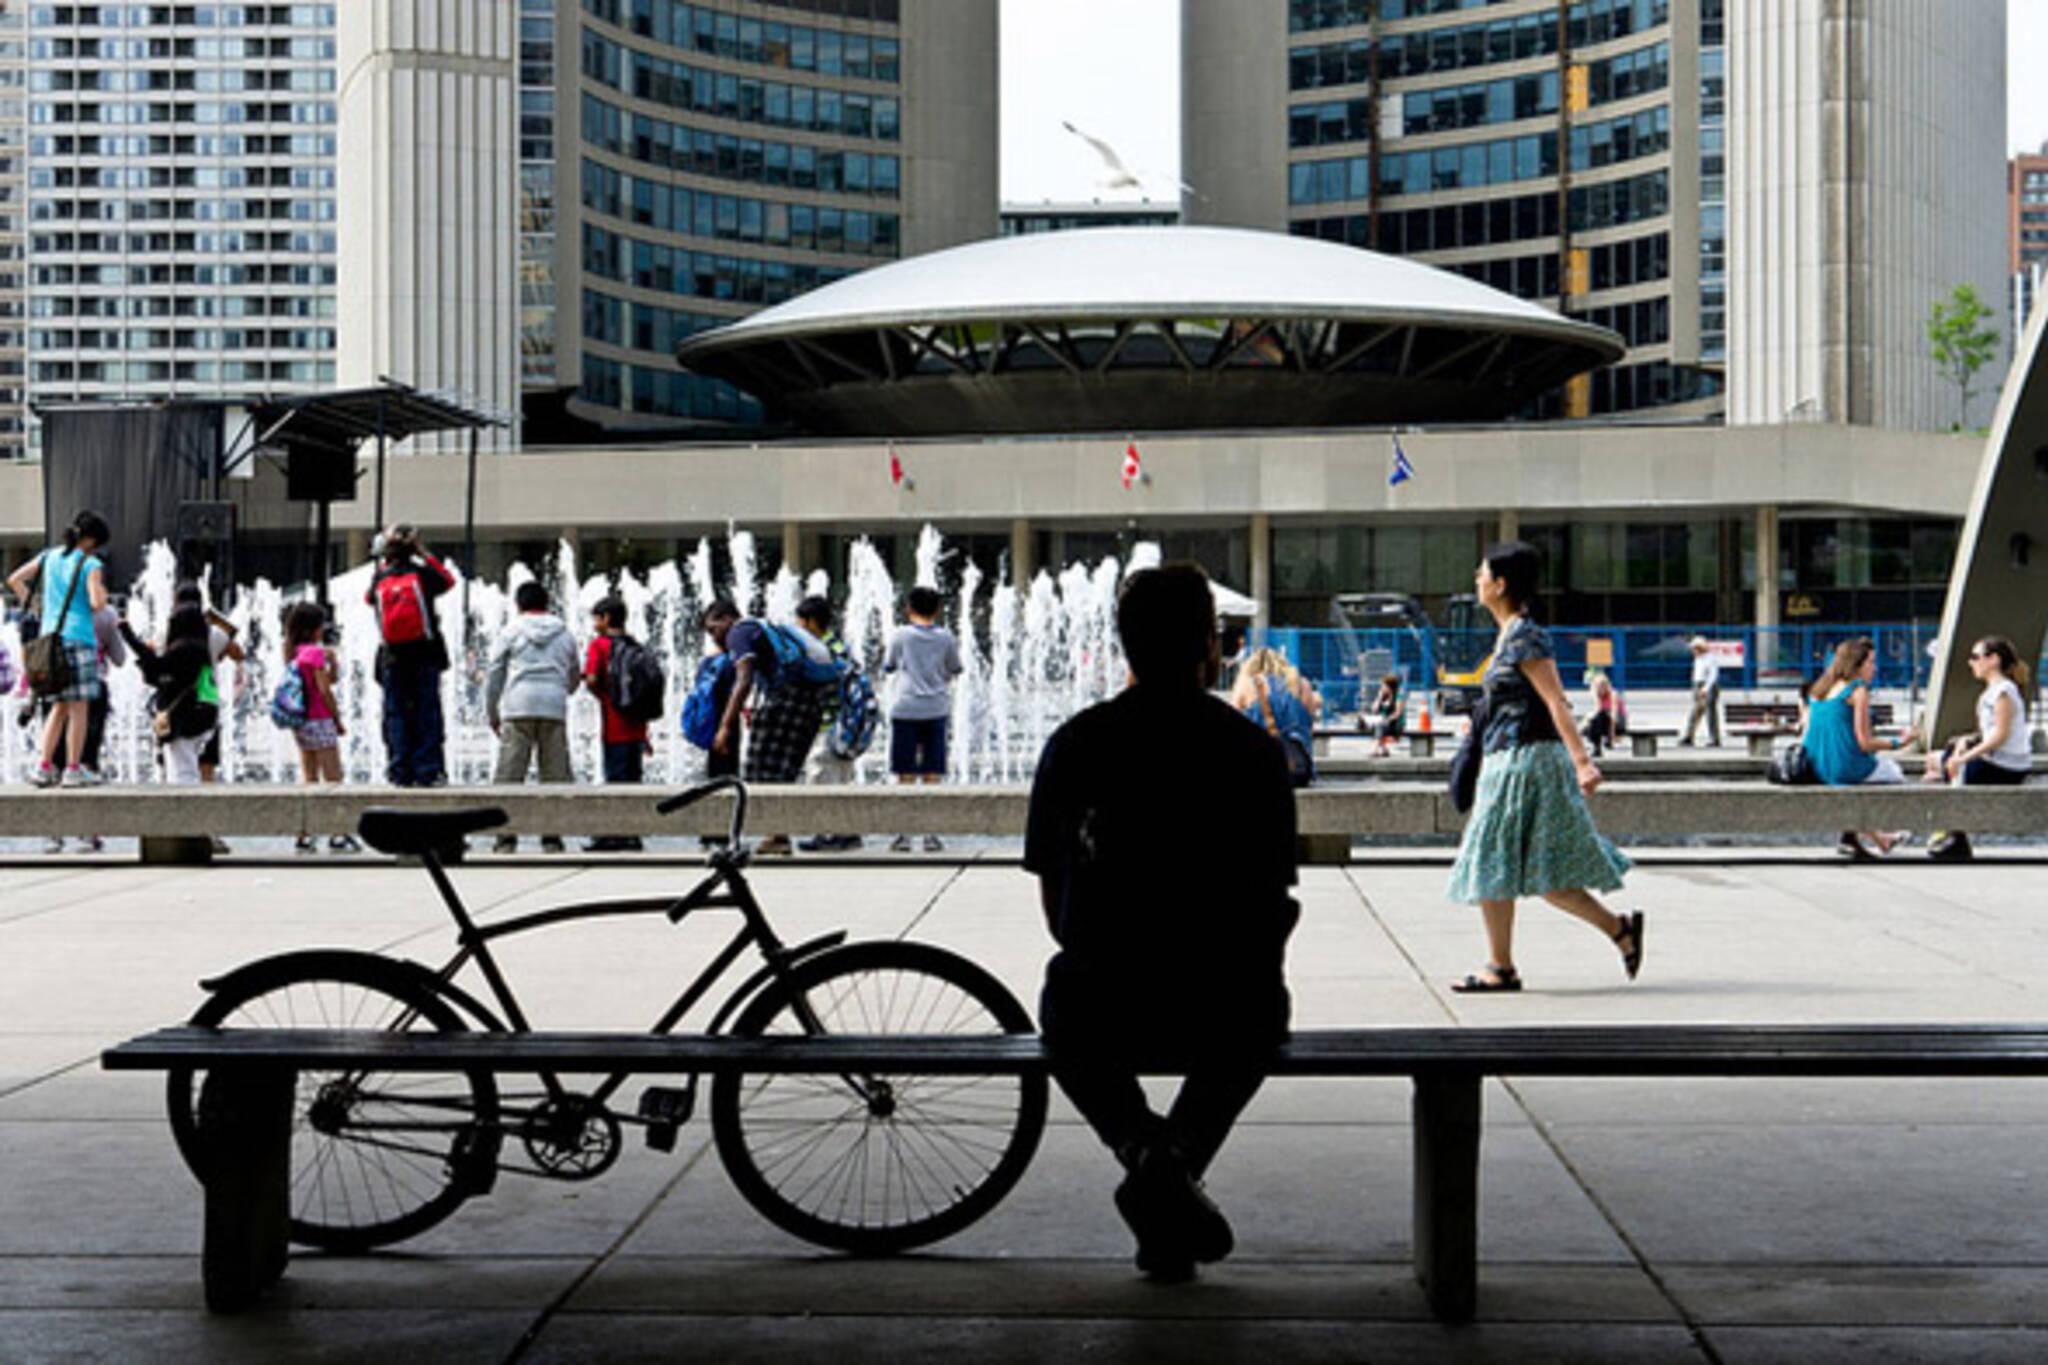 bike, sit, city hall